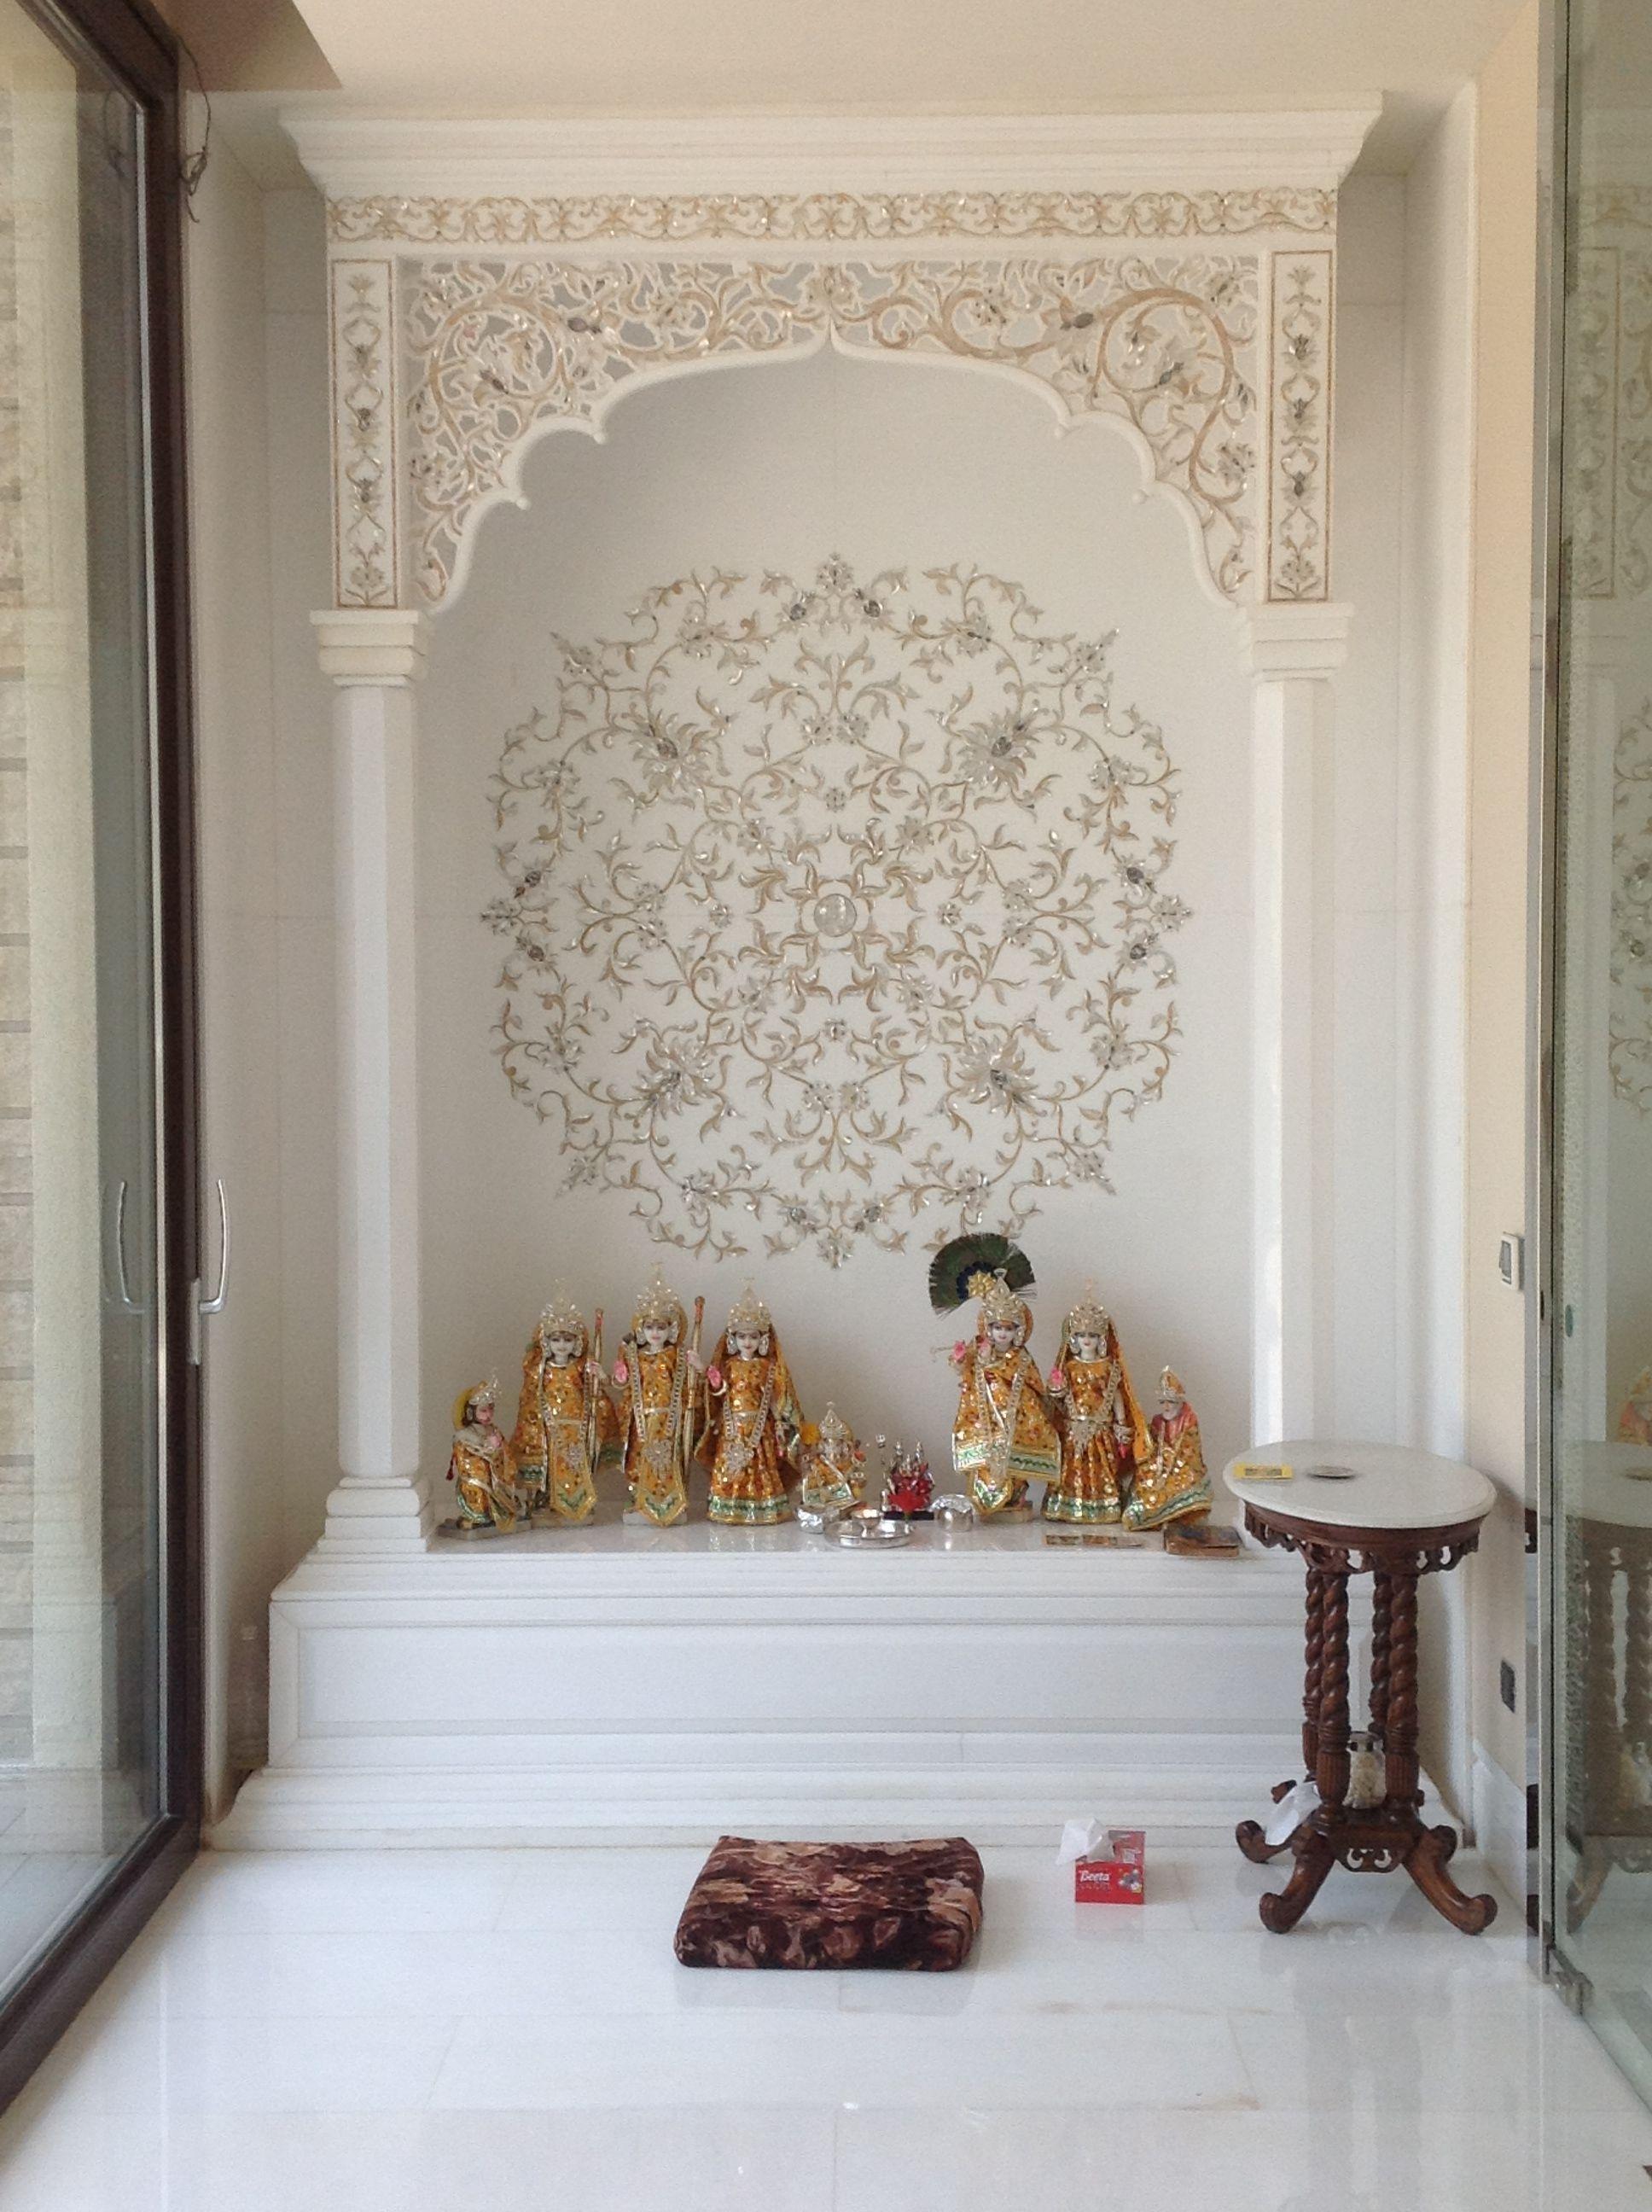 Puja niche more temple room home design also best mandir images hindus pooja rh pinterest